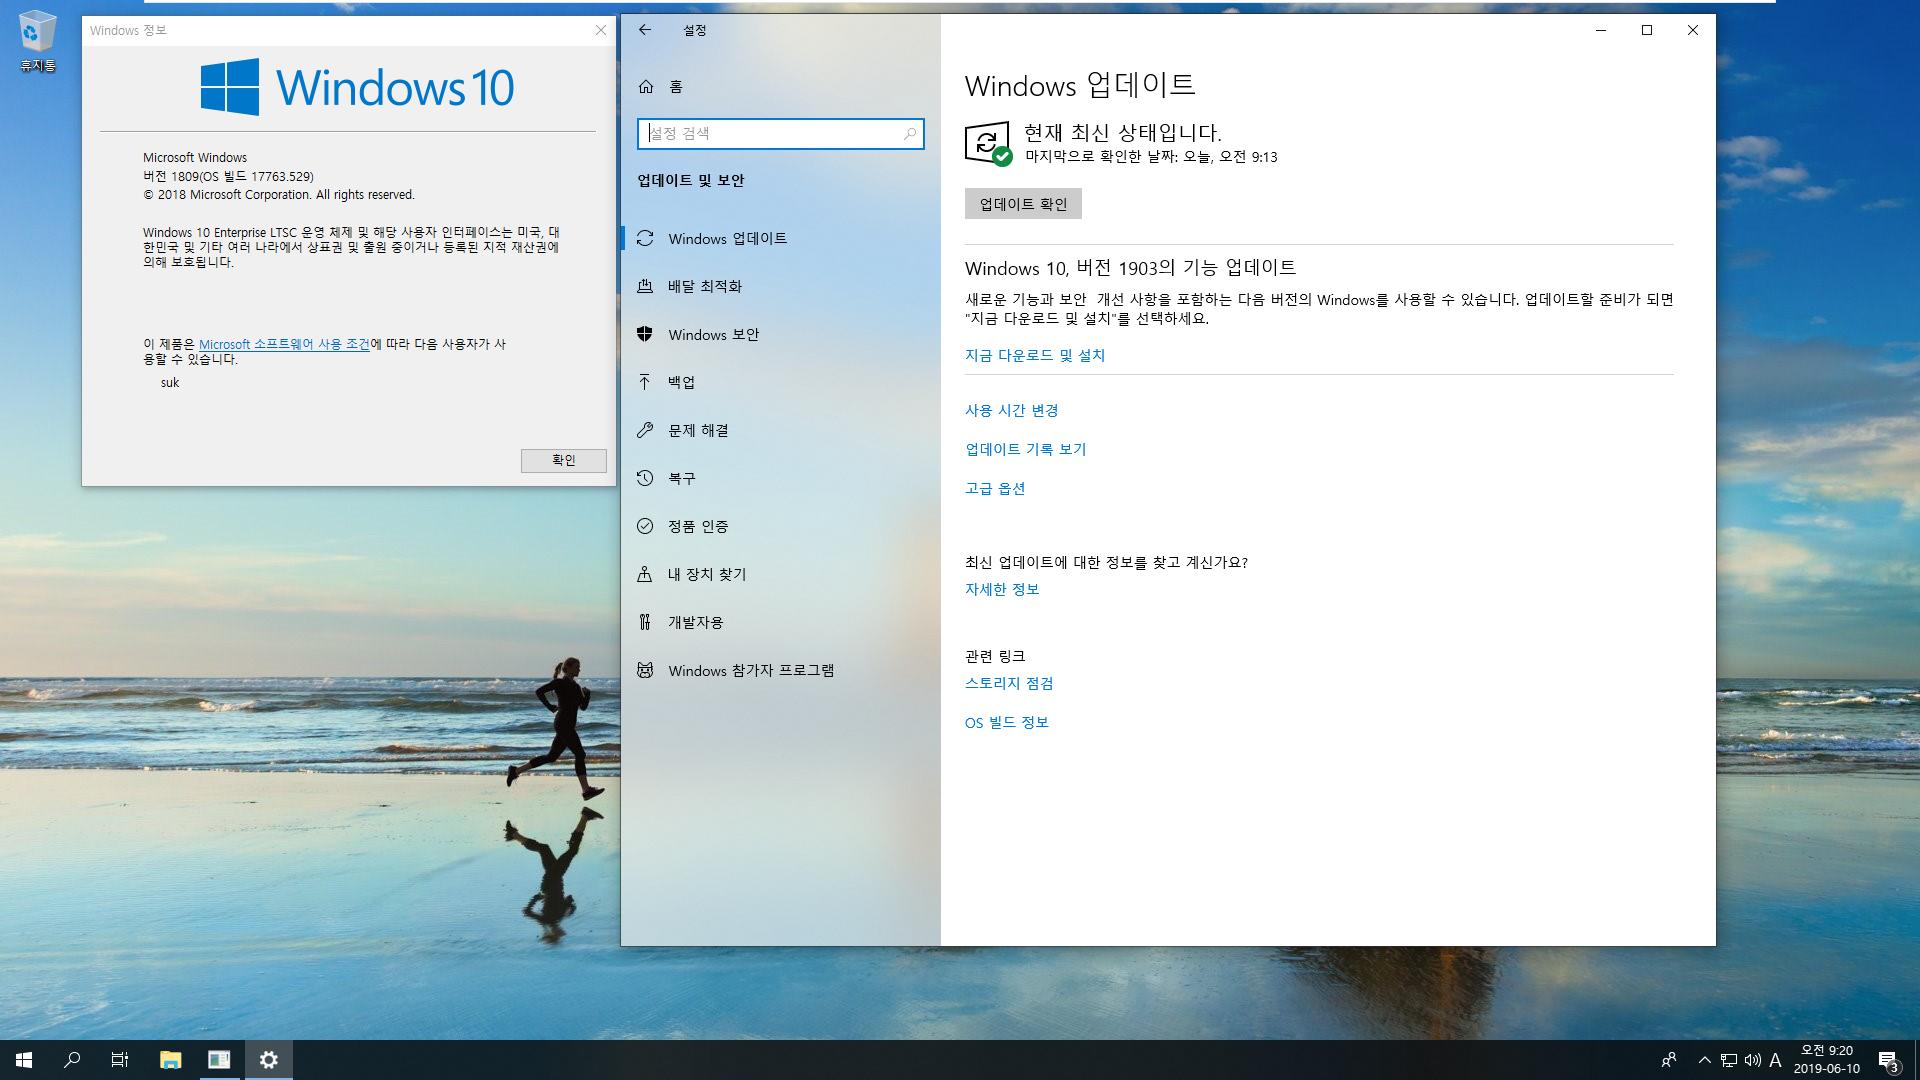 Windows 10 Enterprise LTSC [2019] - 버전 1809, 빌드 17763 - 버전 1903 기능 업데이트 테스트 2019-06-10_092057.png